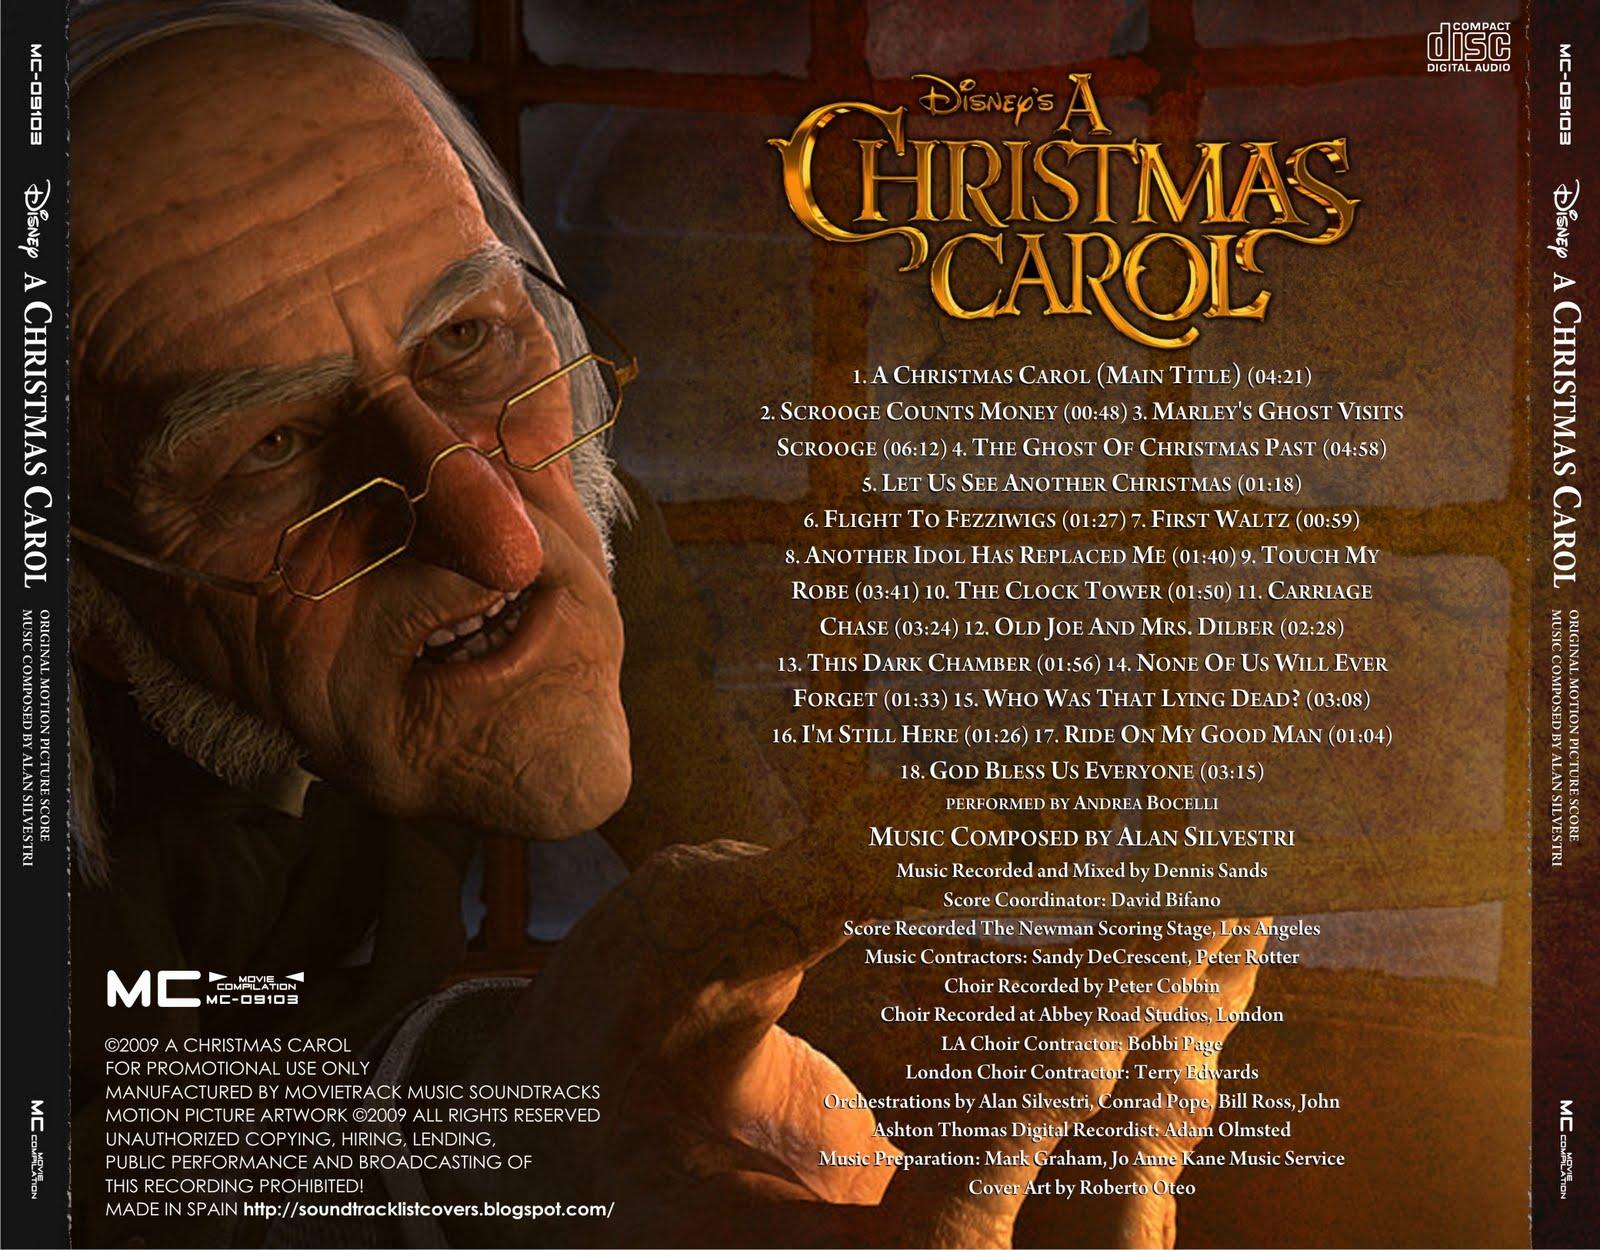 A Christmas Carol Soundtrack.Soundtrack List Covers A Christmas Carol Alan Silvestri